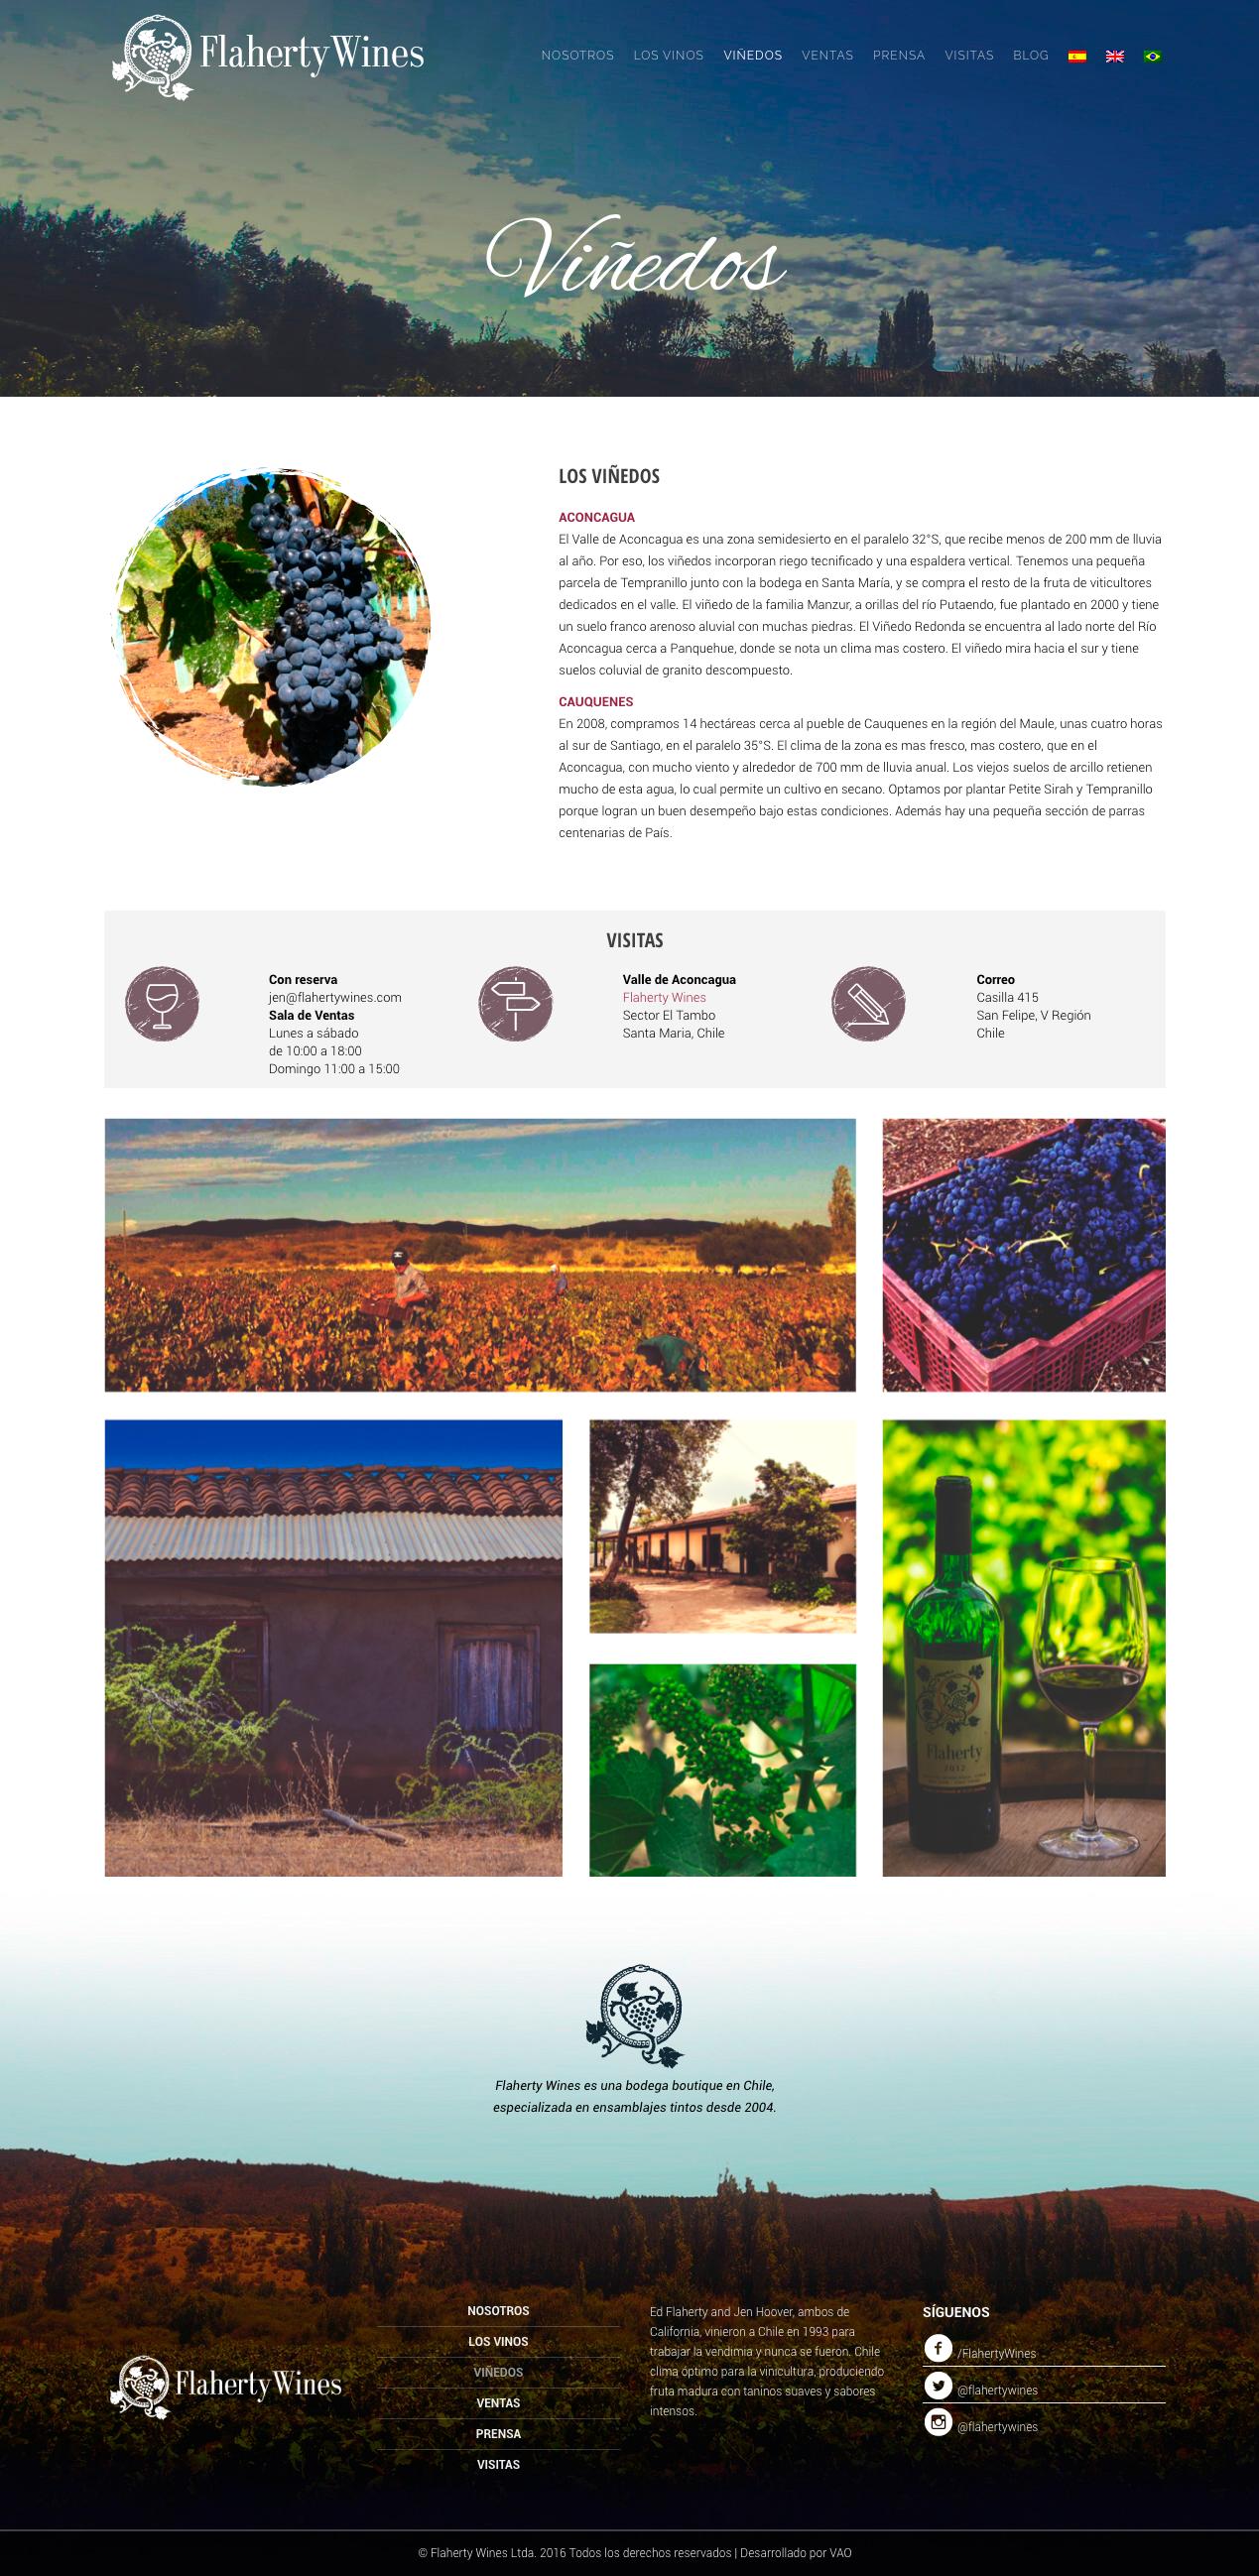 flaherty wines web viñedos